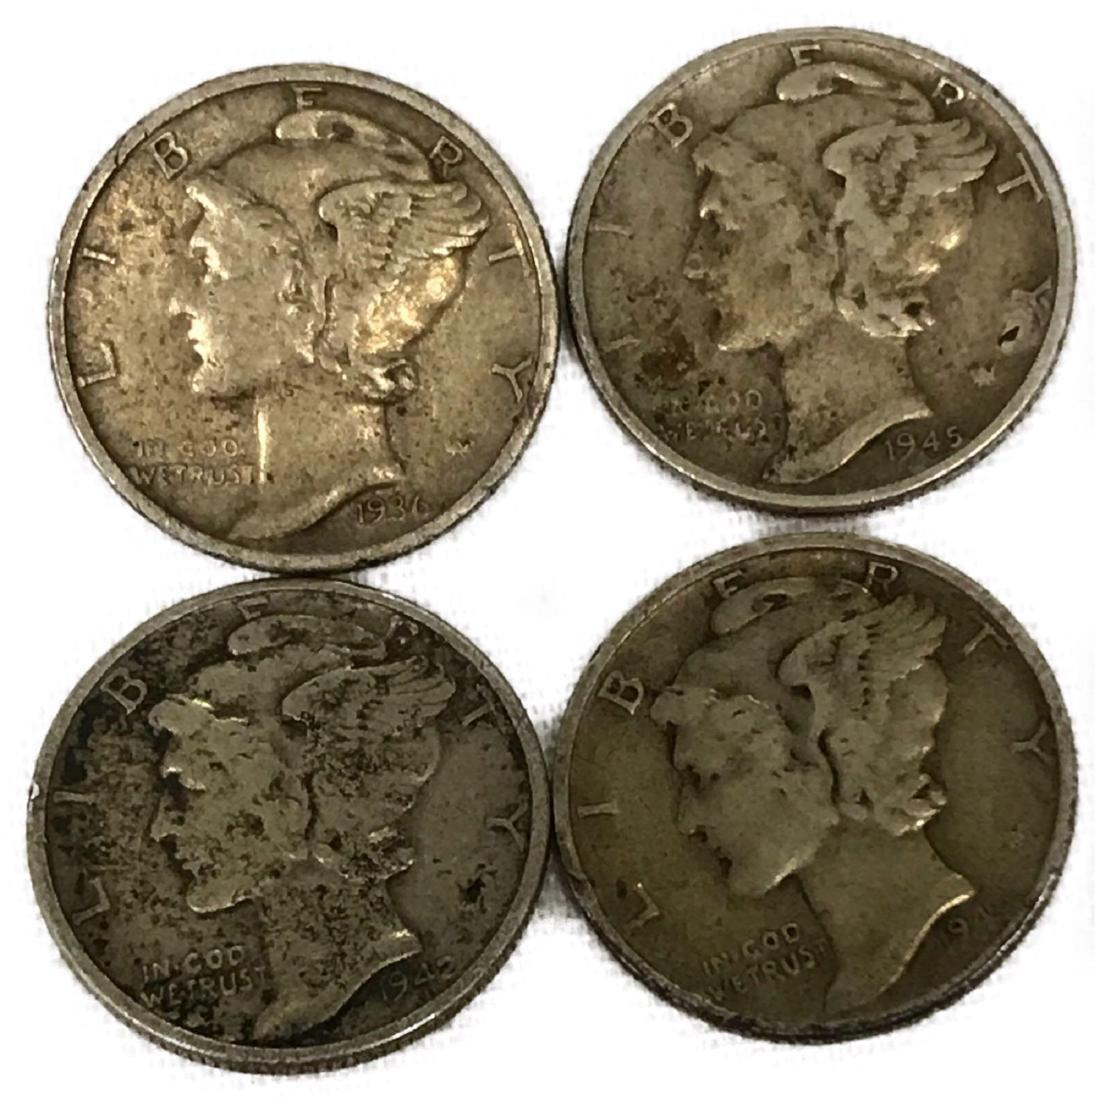 4 Mercury Dimes 1936, 1941, 1942, 1945